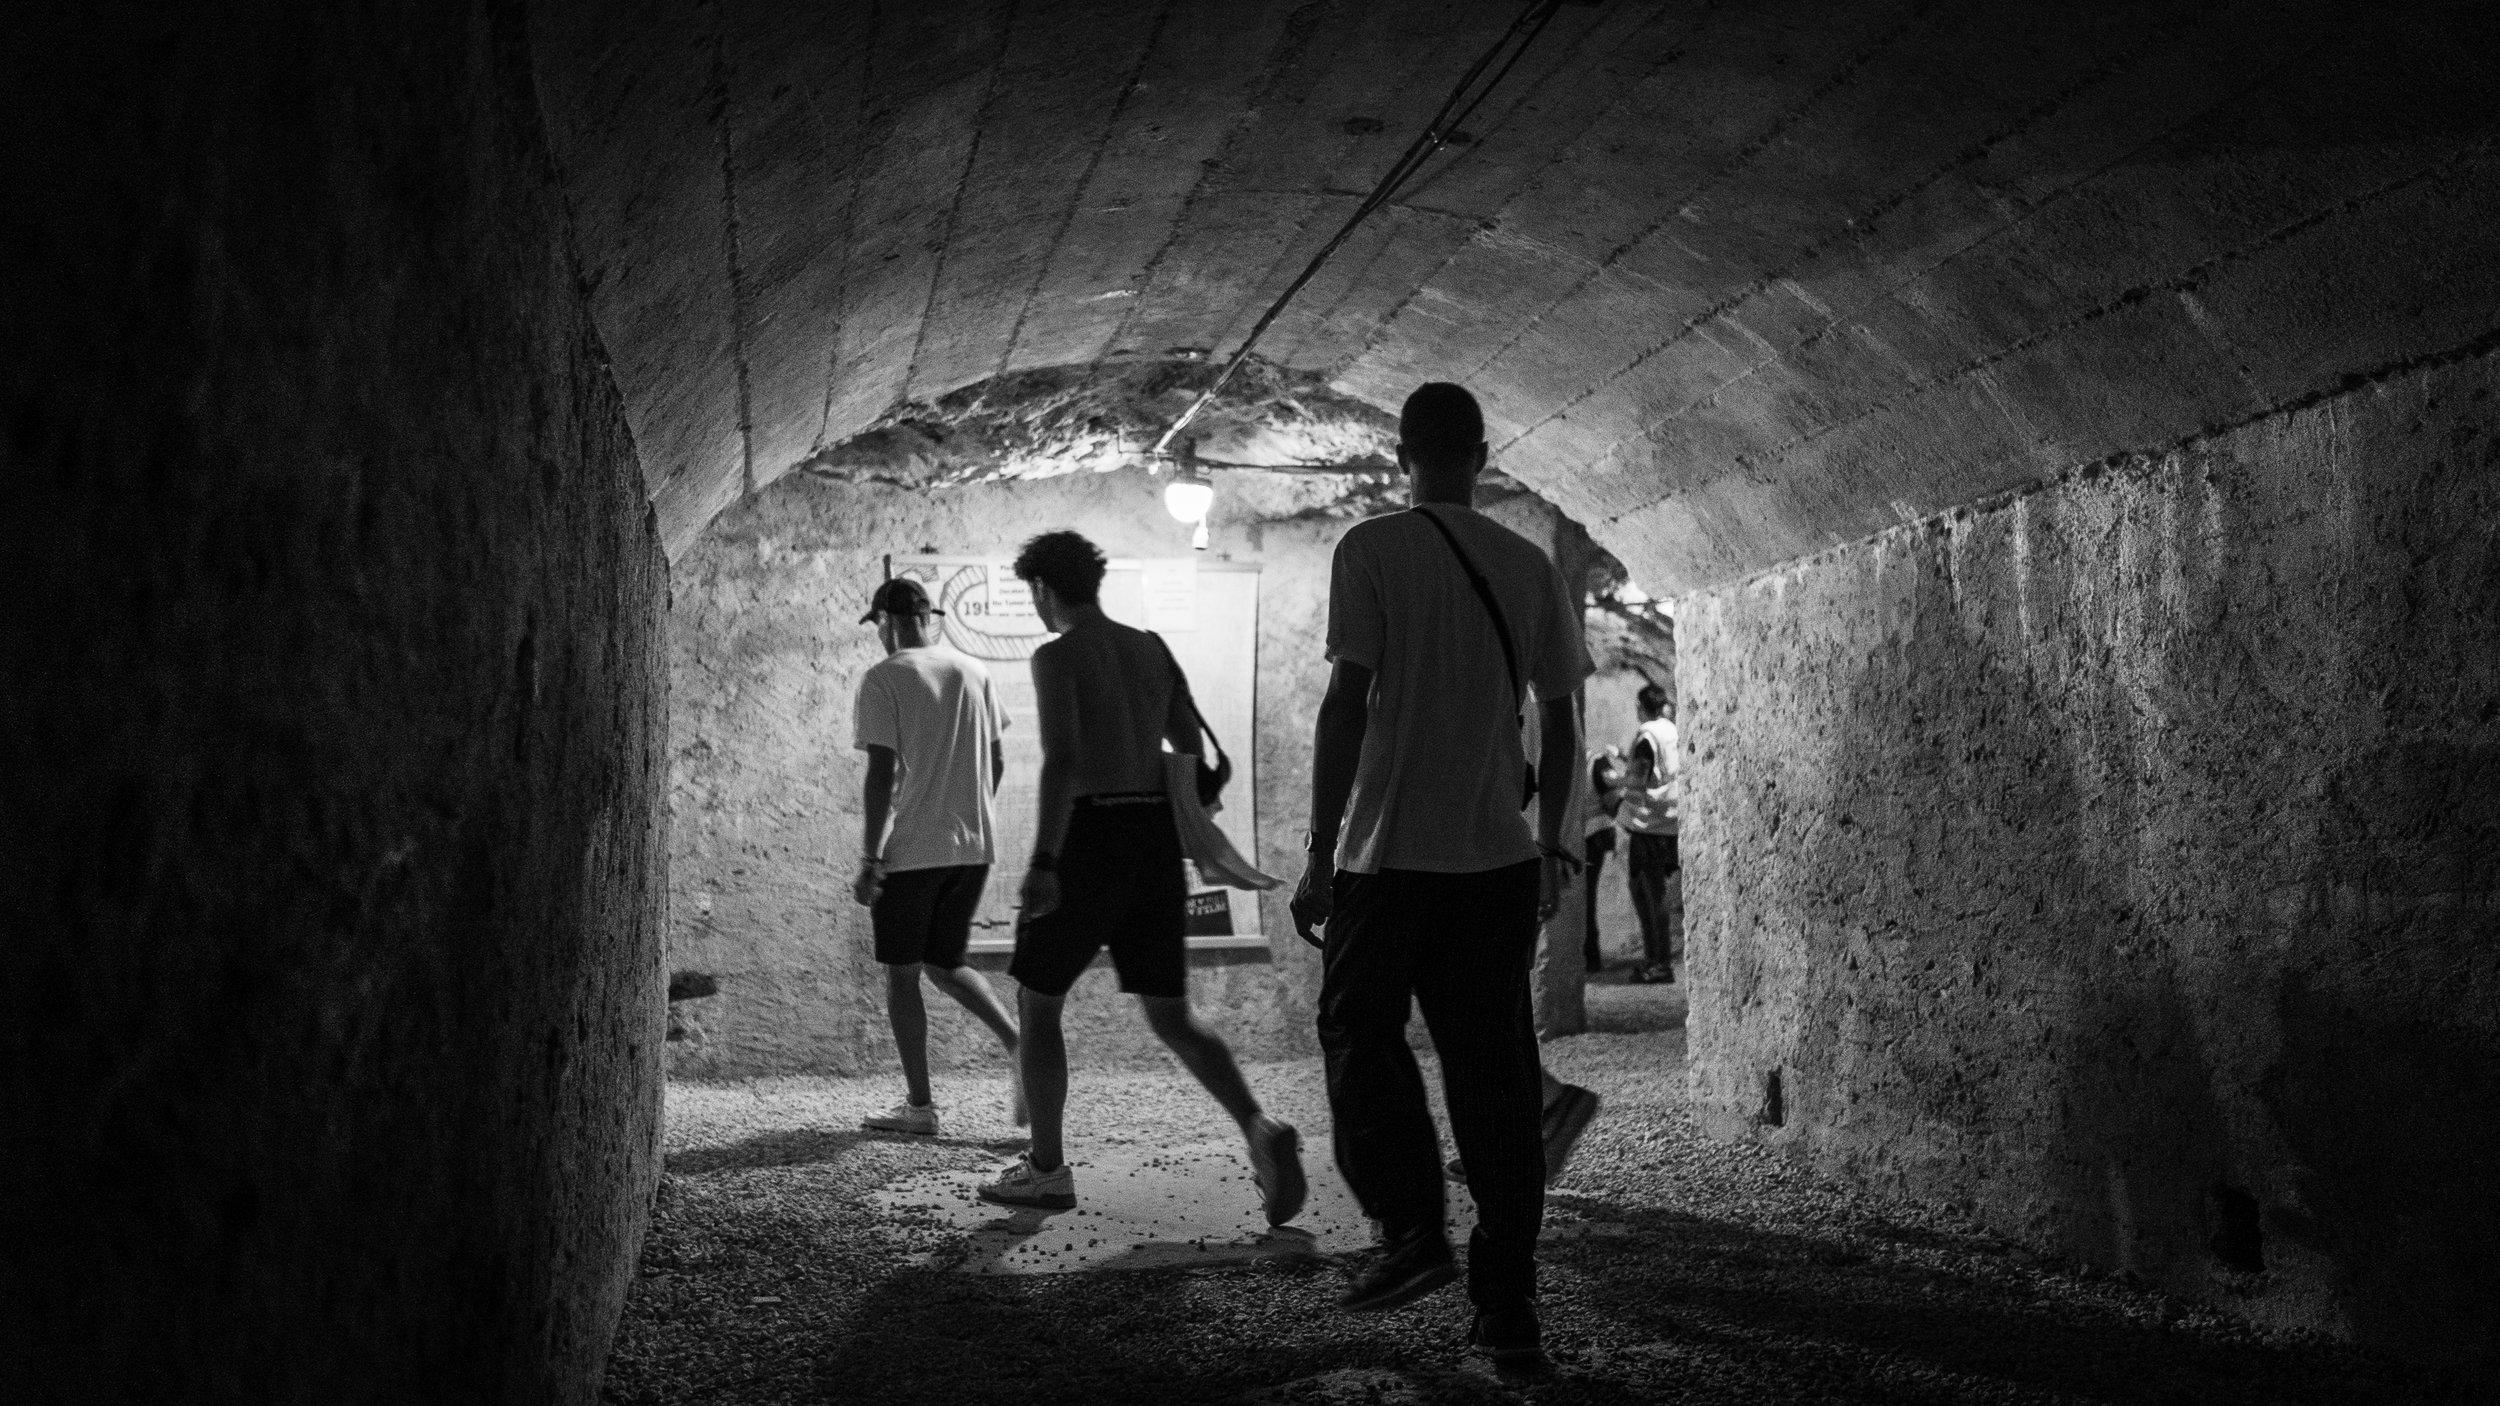 Residents Advisor Dimensions Festival Tunnel Party 2018 by Callum Chaplin